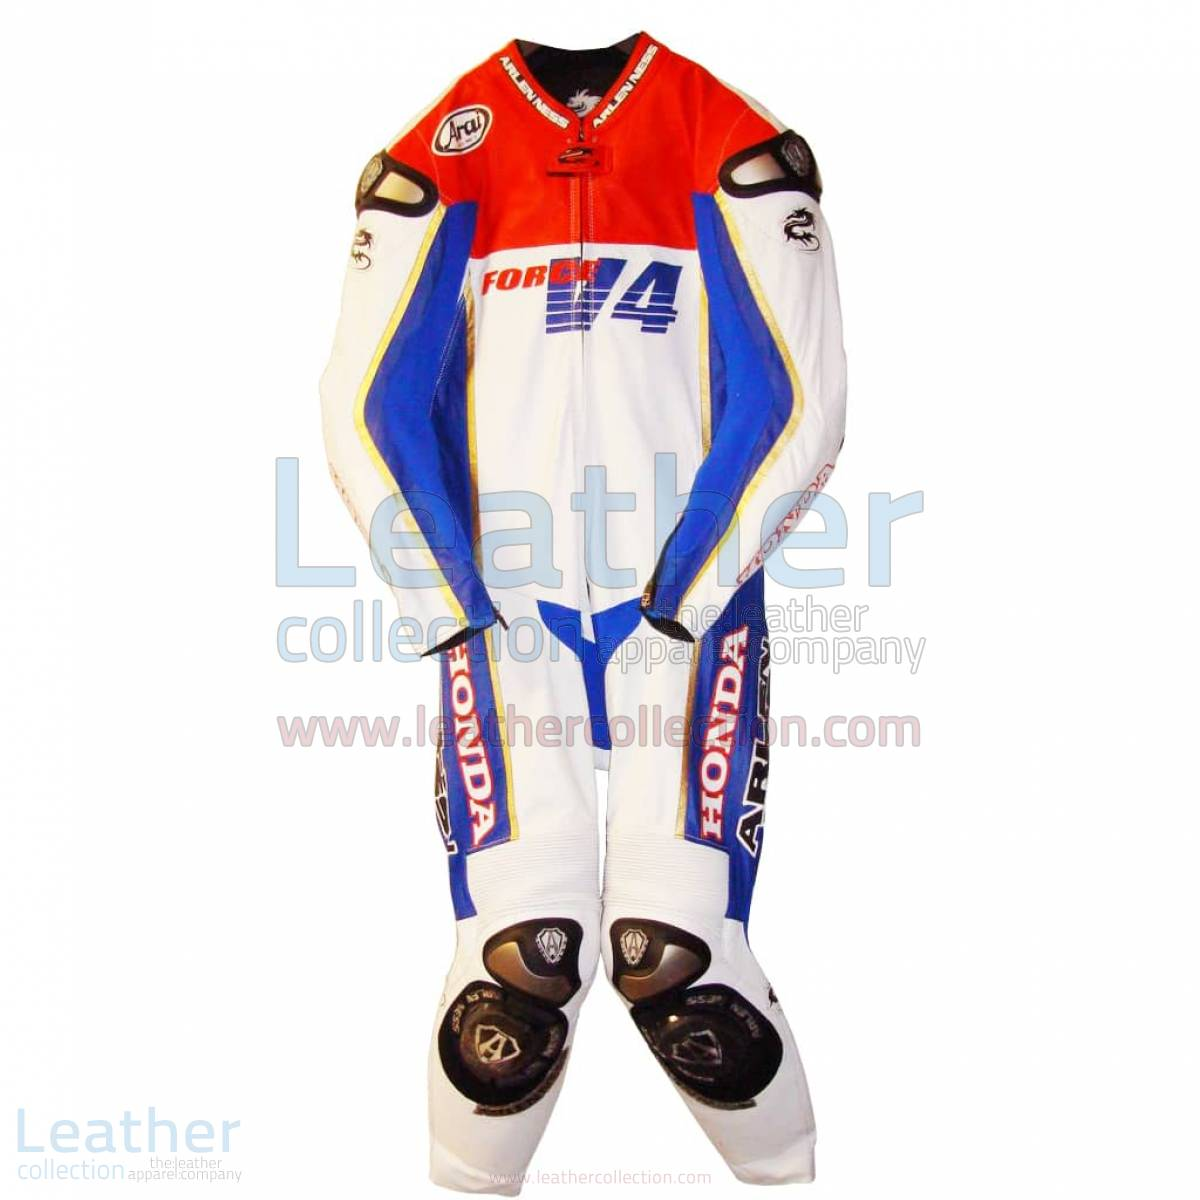 Roger Burnett Honda Goodwood Racing Suit – Honda Suit